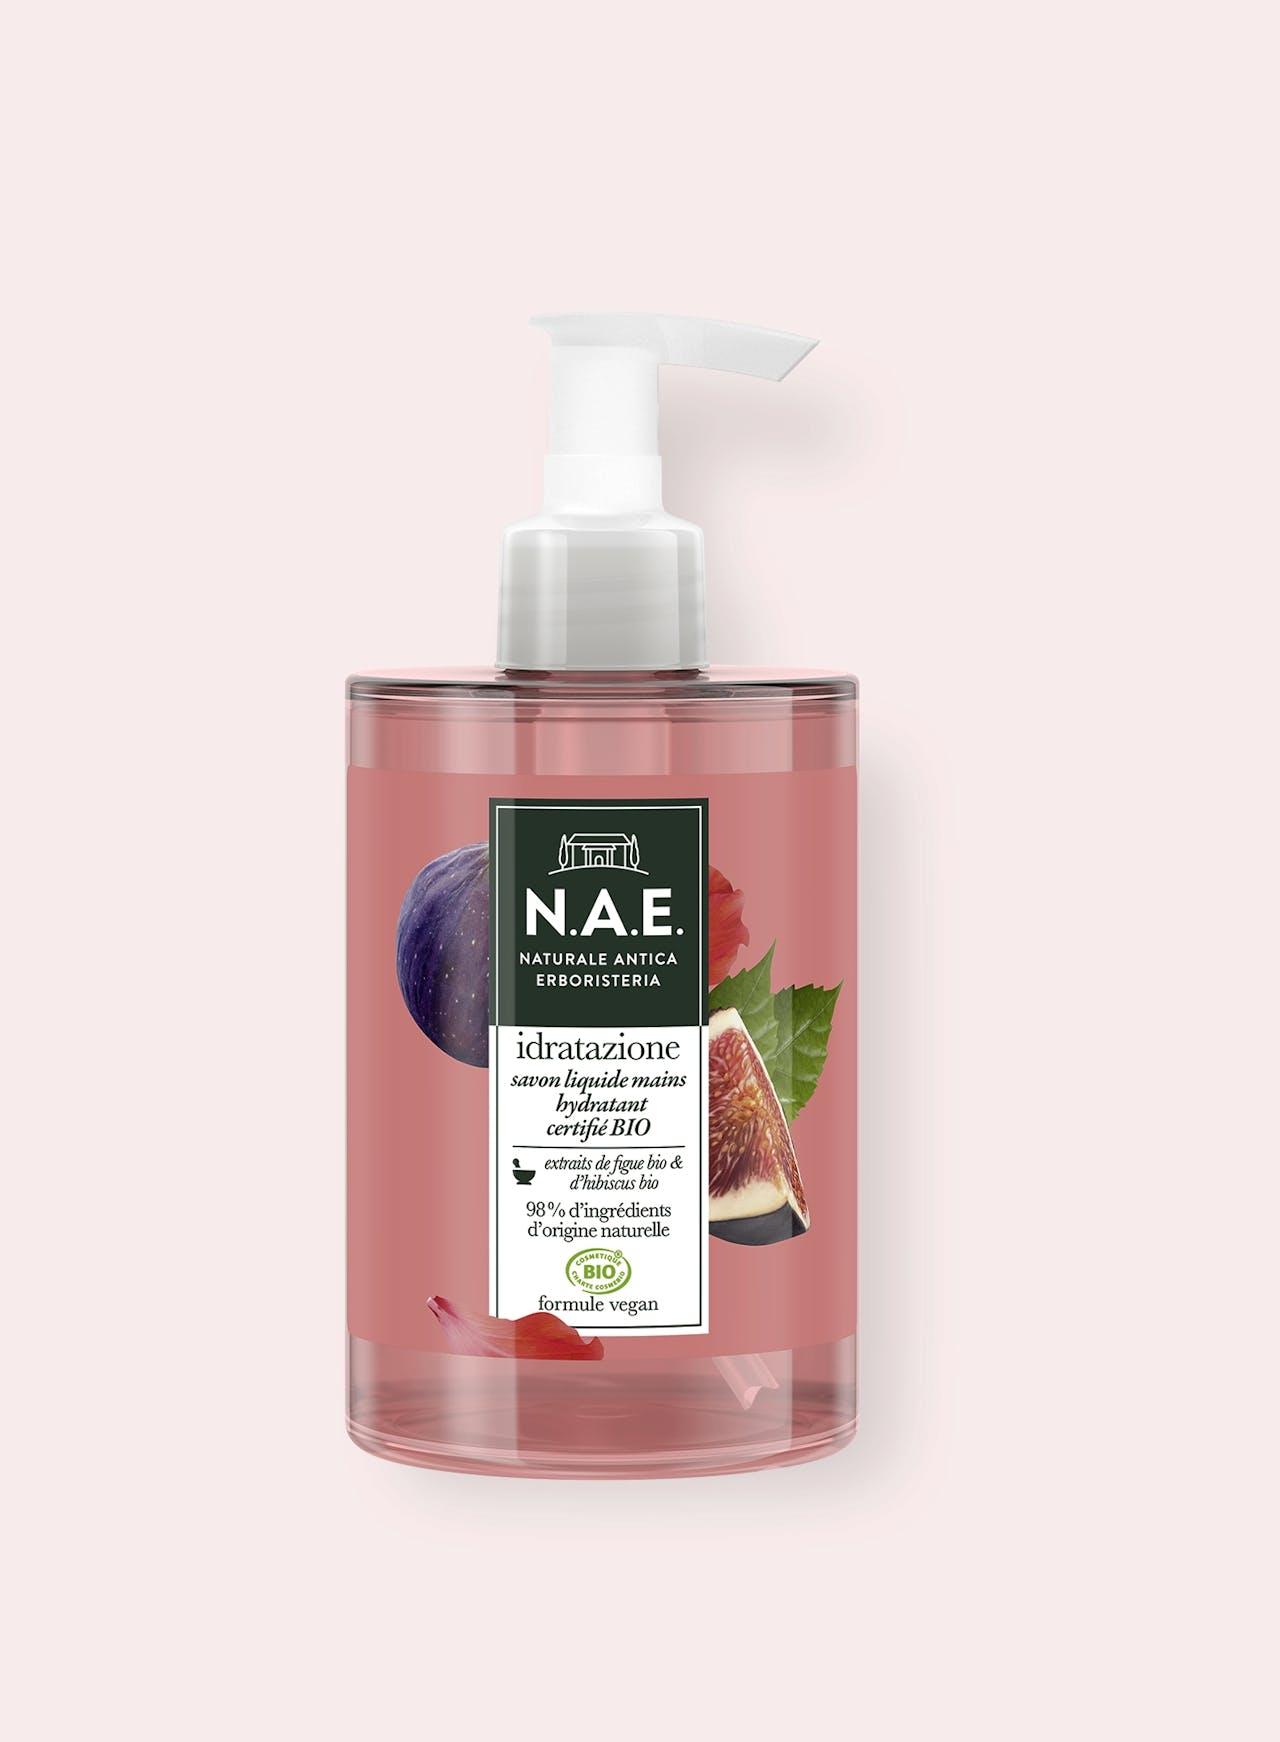 savon-liquide-mains-nae-bio-idratazione